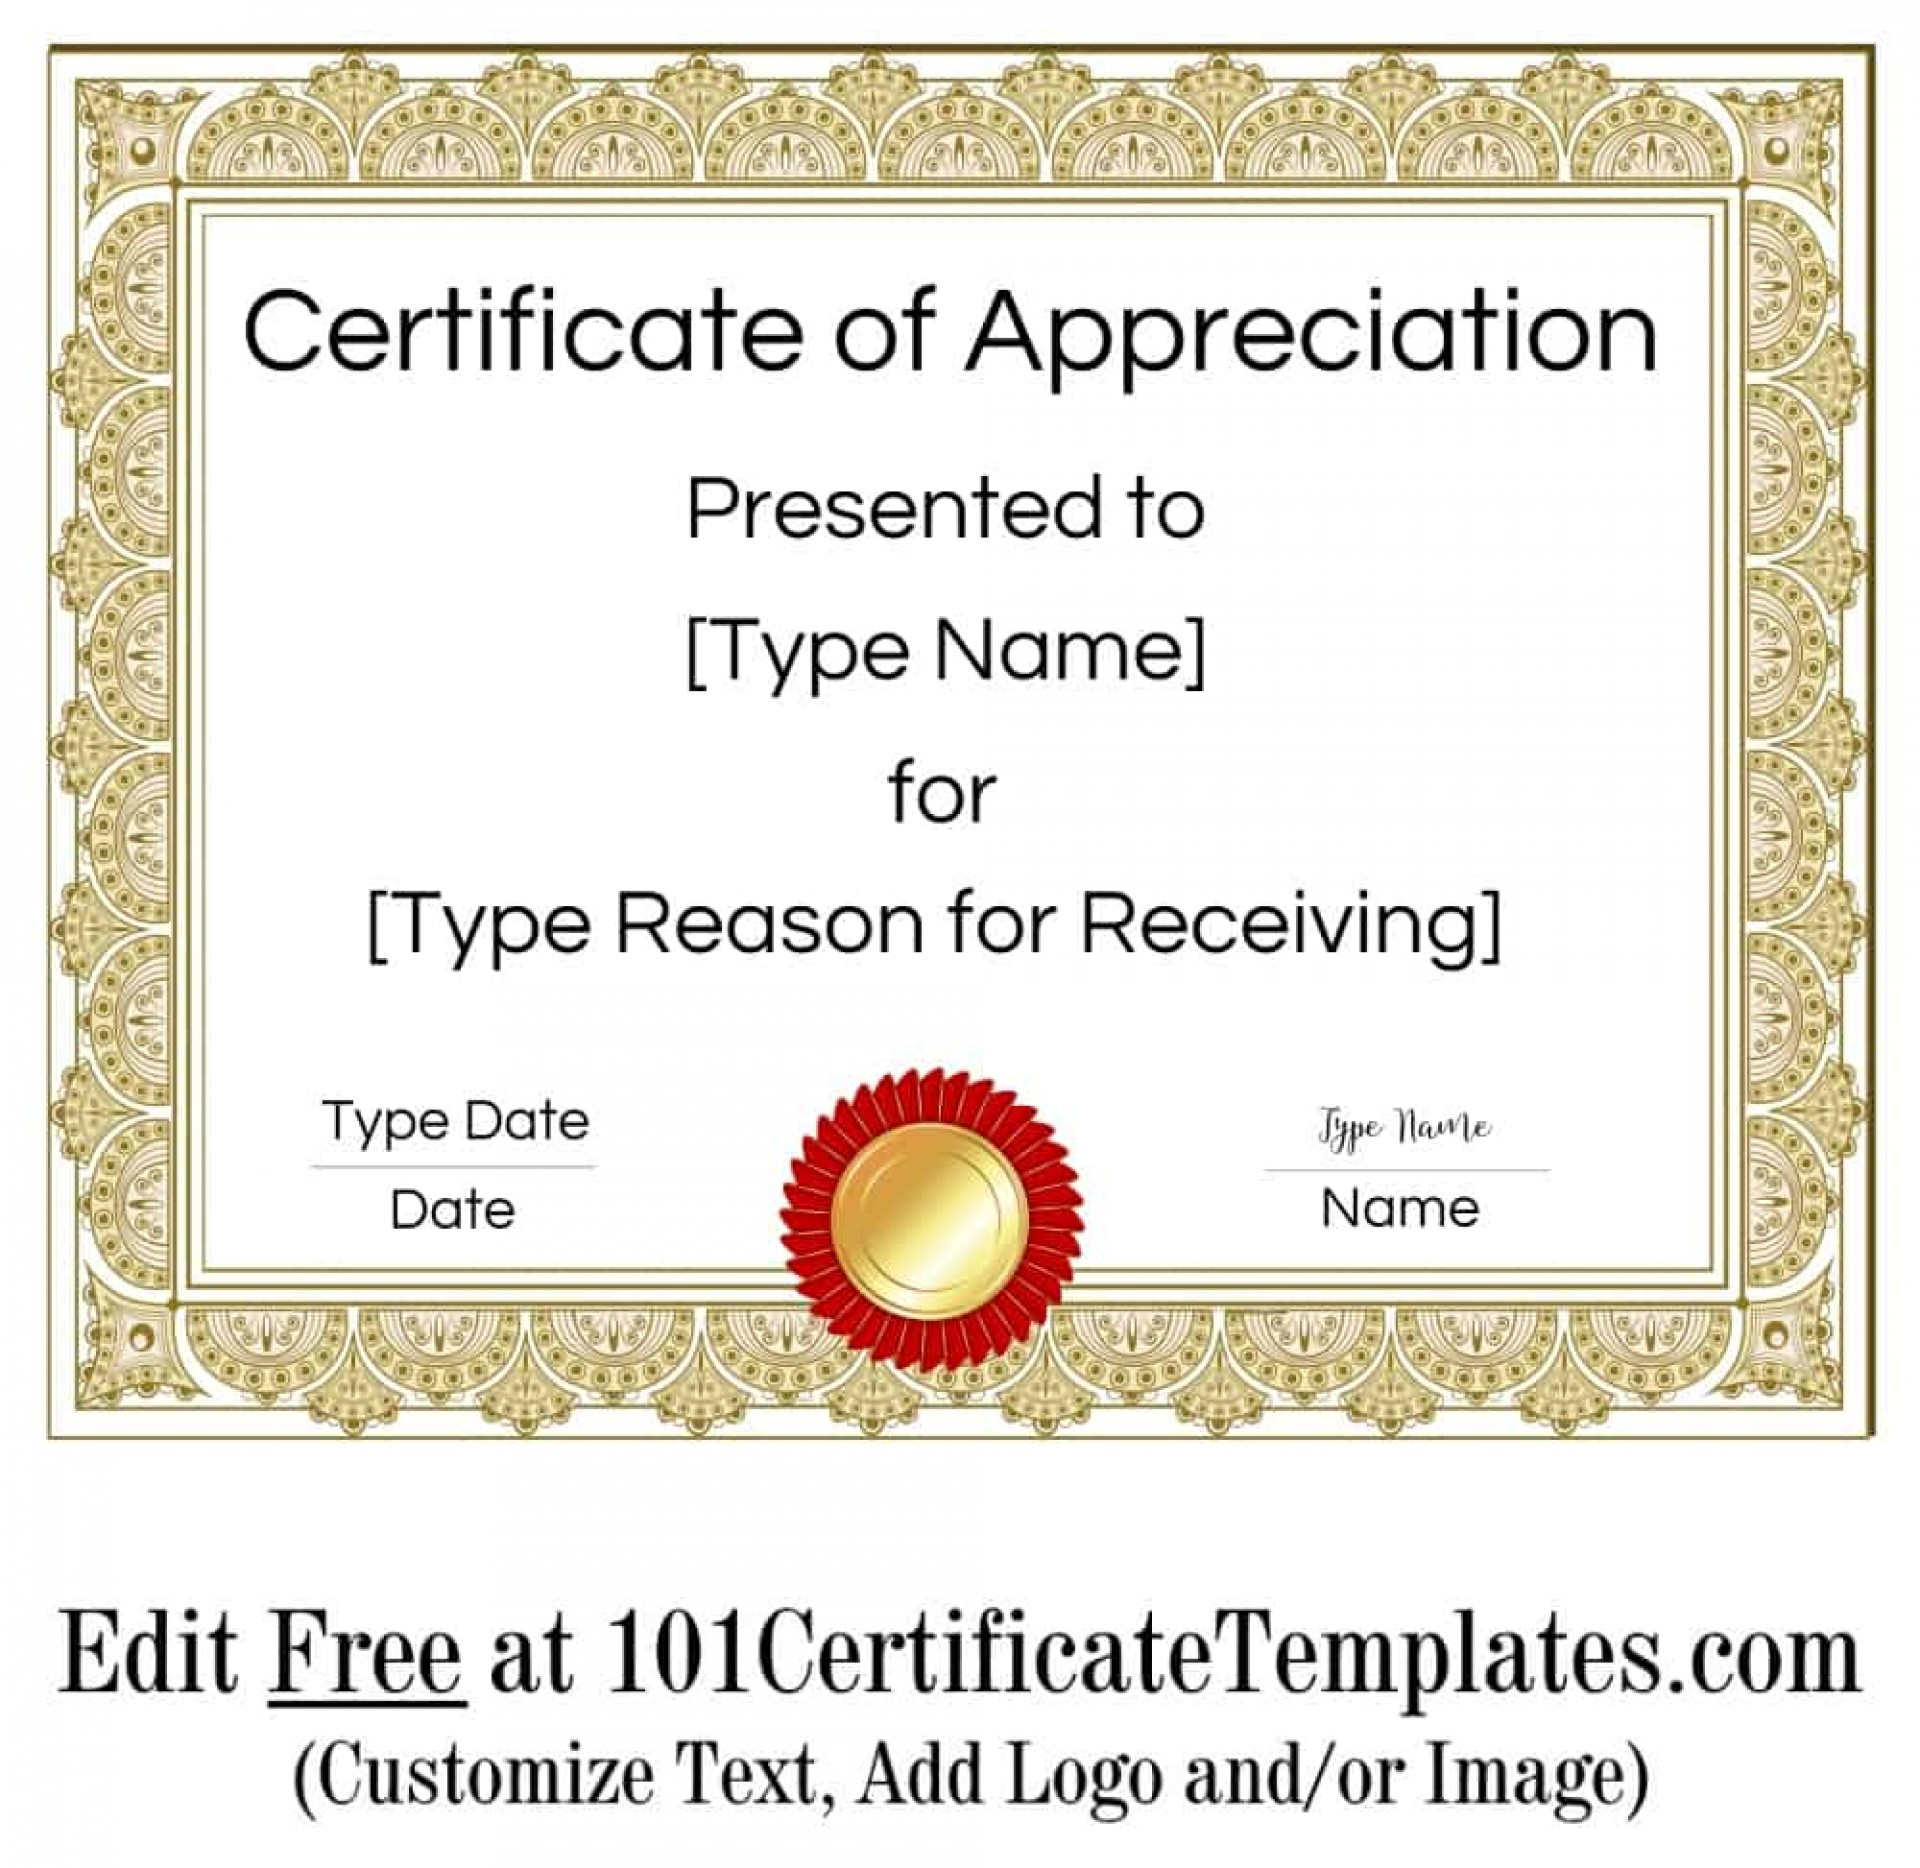 009 Stupendou Certificate Of Appreciation Template Free Design  Microsoft Word Download Publisher Editable1920